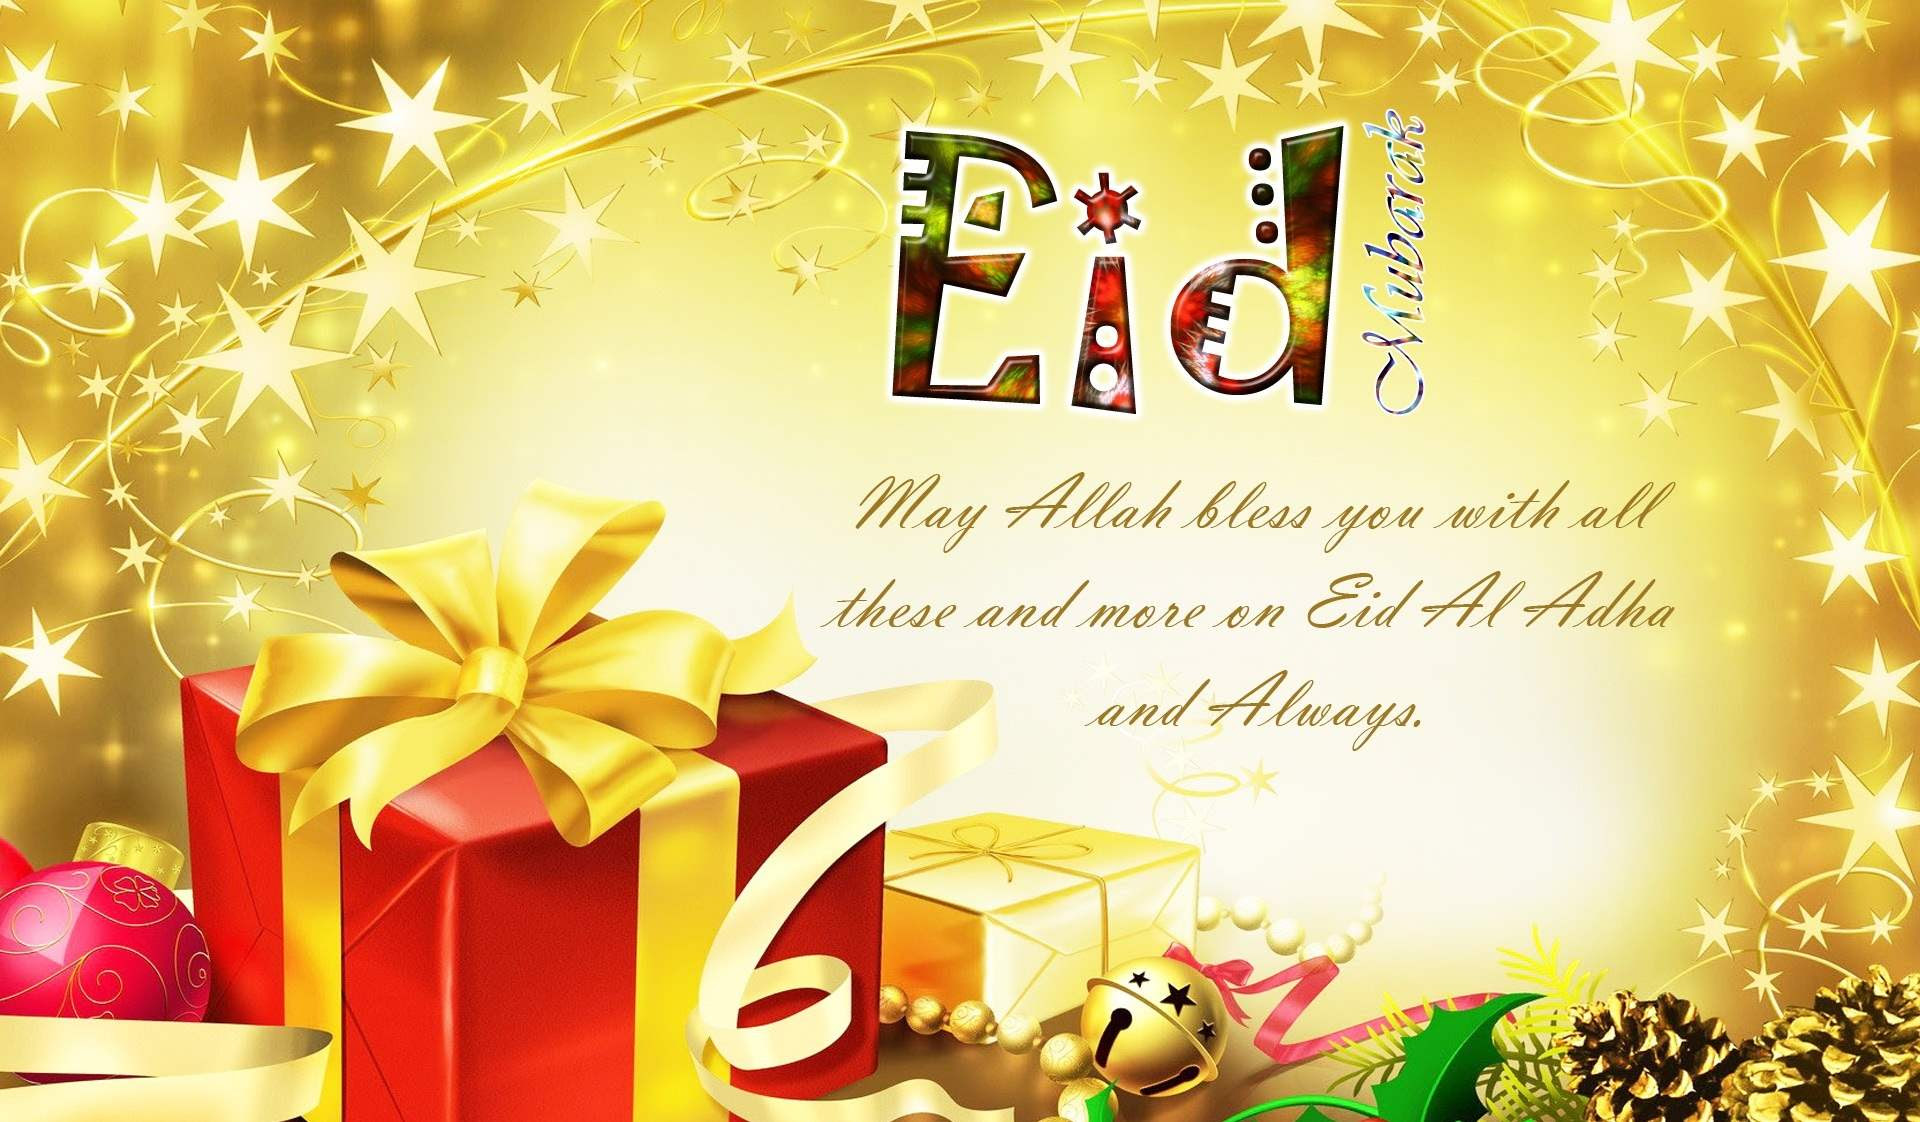 35 Happy Eid Mubarak 2015 HD Wallpapers and Photos